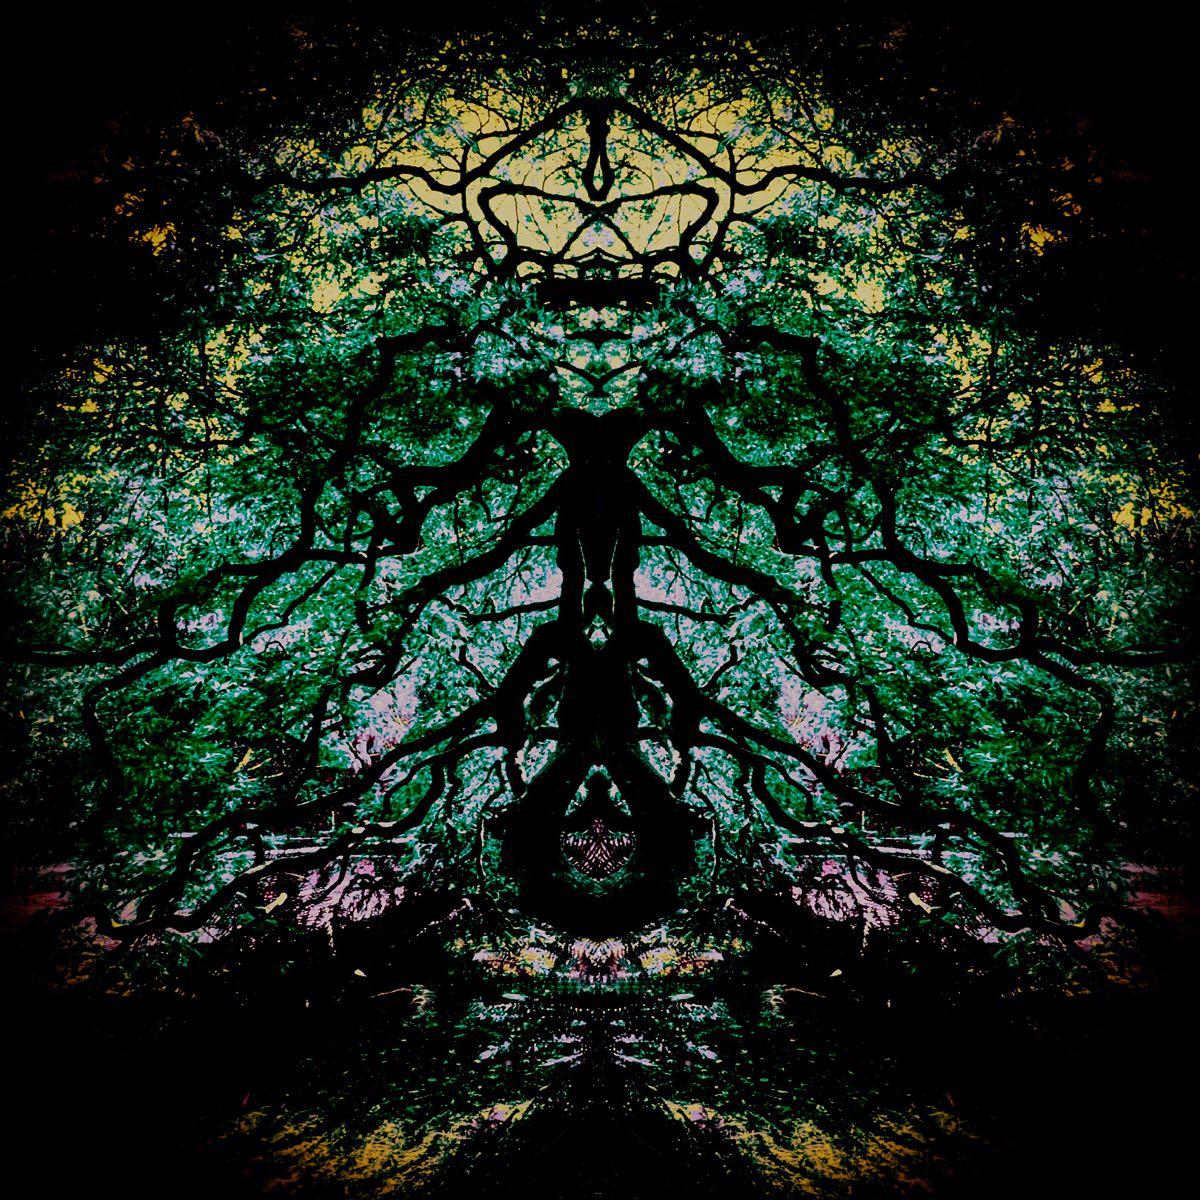 Subconscious - Tree Creatures #4 (40x40 cm) - Print on cotton paper 2020